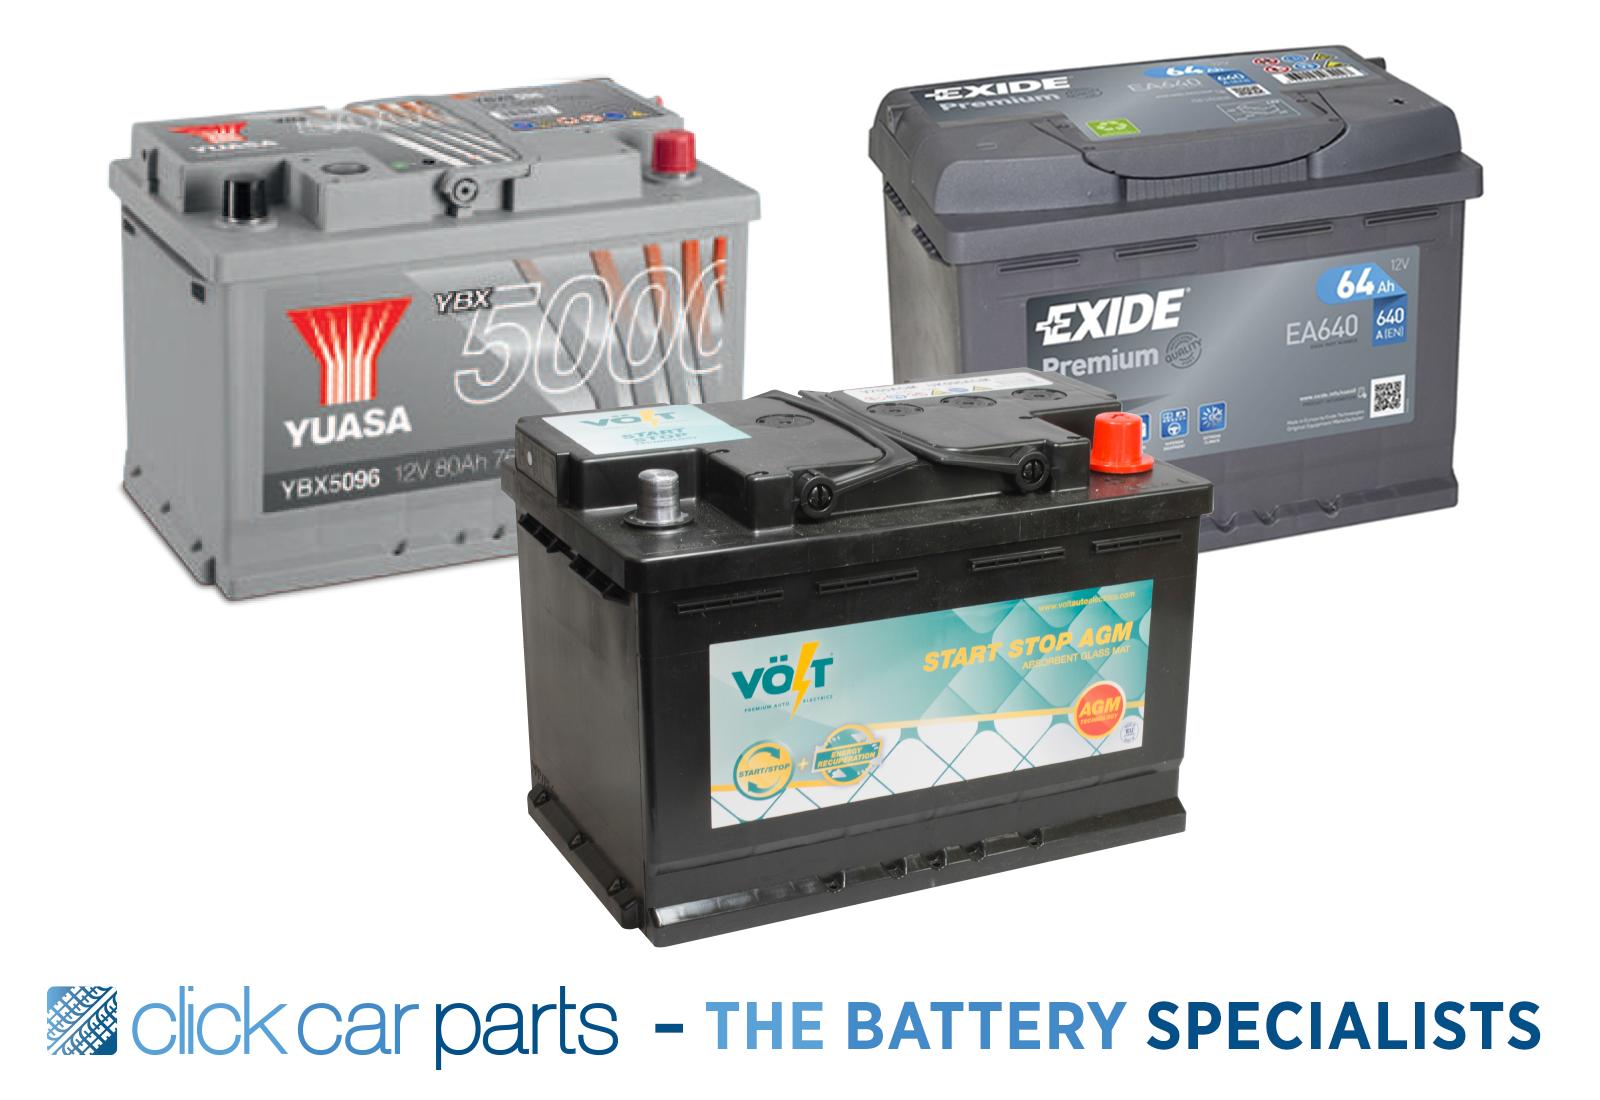 YUASA PREMIUM 12v Type 049 Car Battery 3 Year Warranty EB451 YBX1049